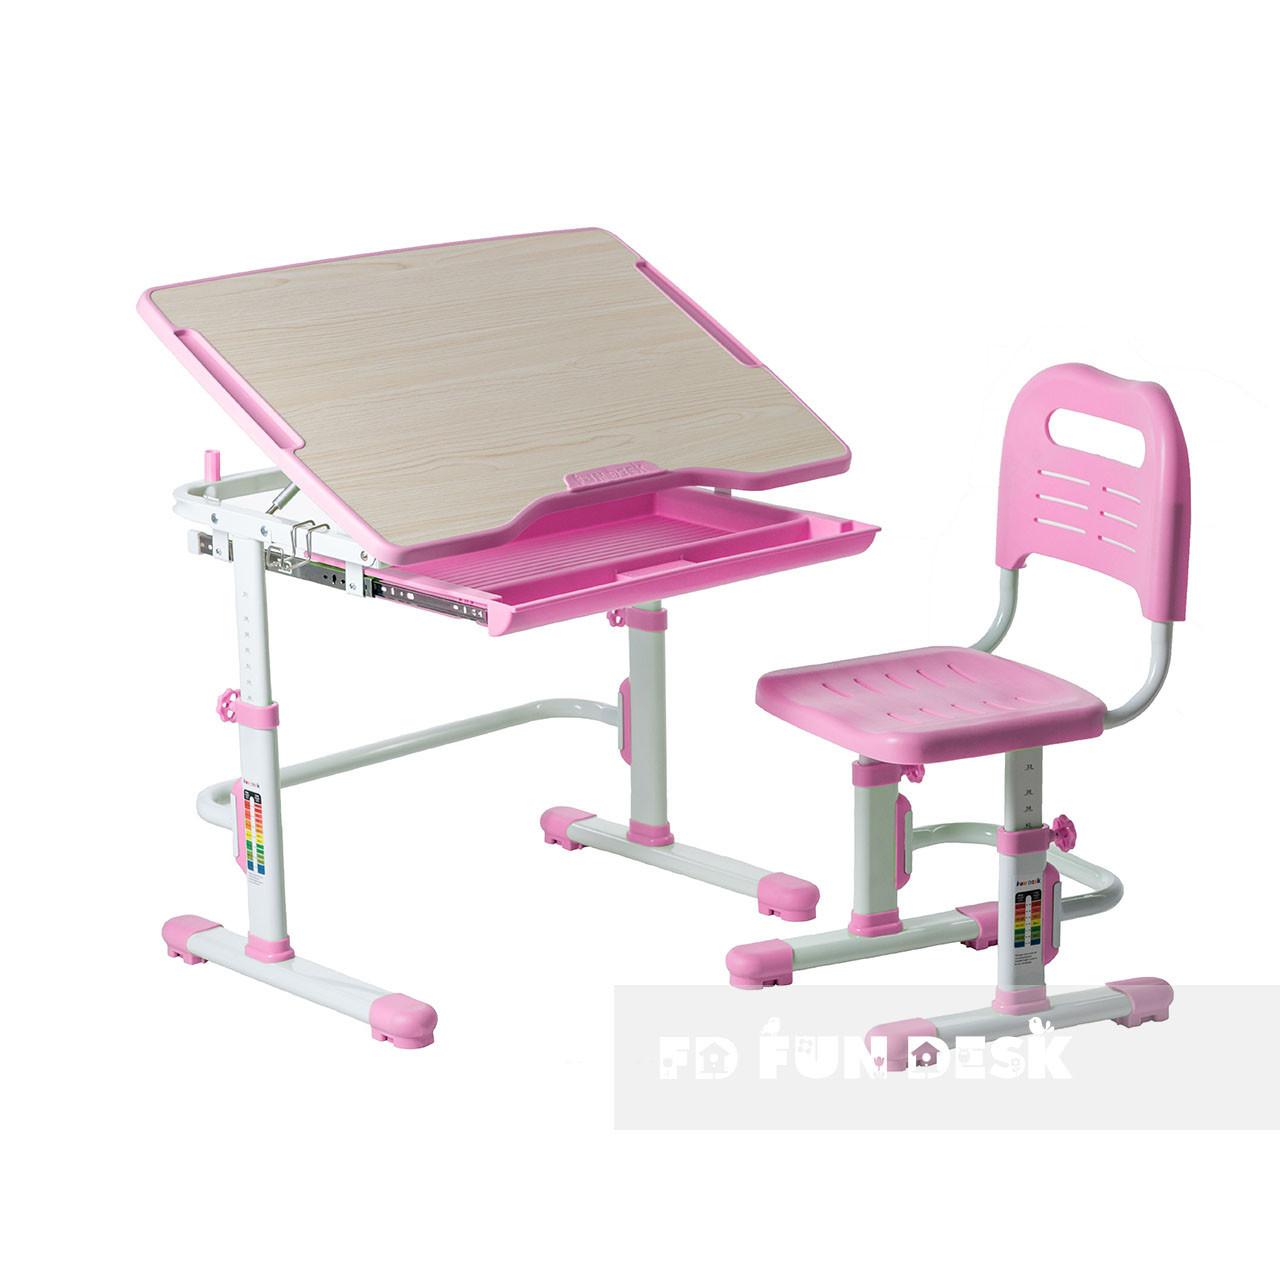 Комплект парта + стул трансформеры Vivo Pink FUNDESK